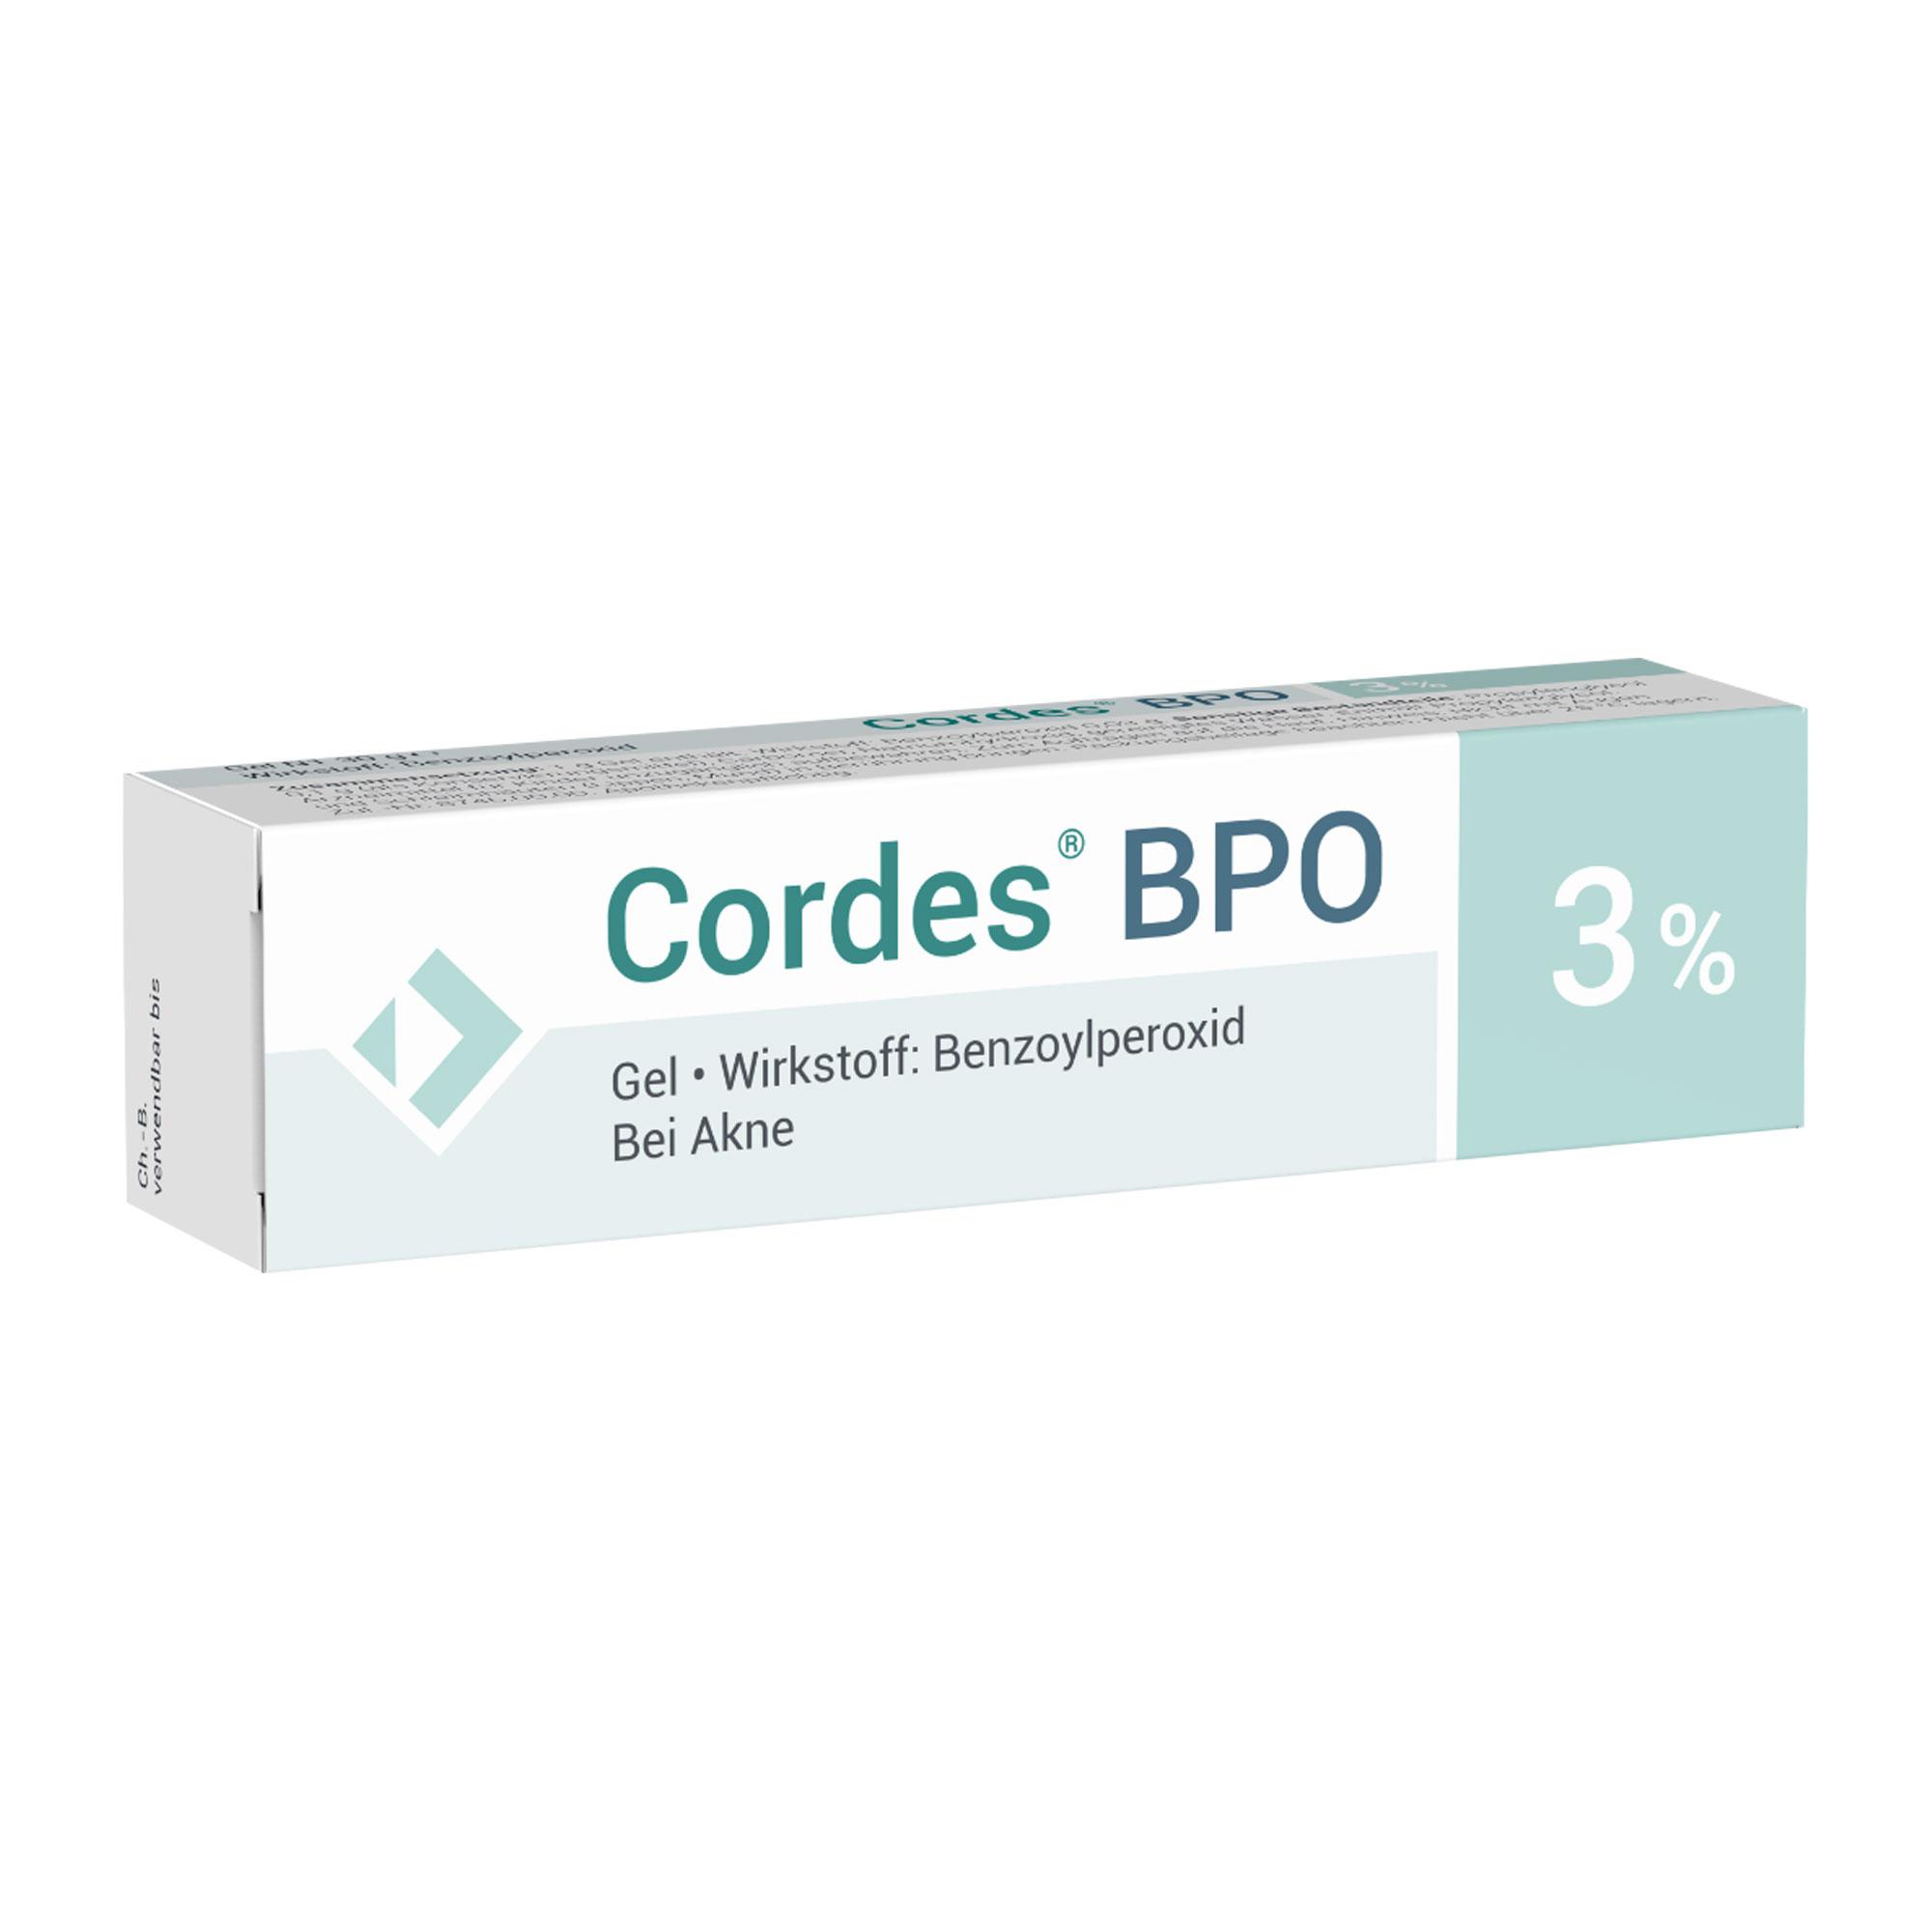 Cordes BPO 3% Gel